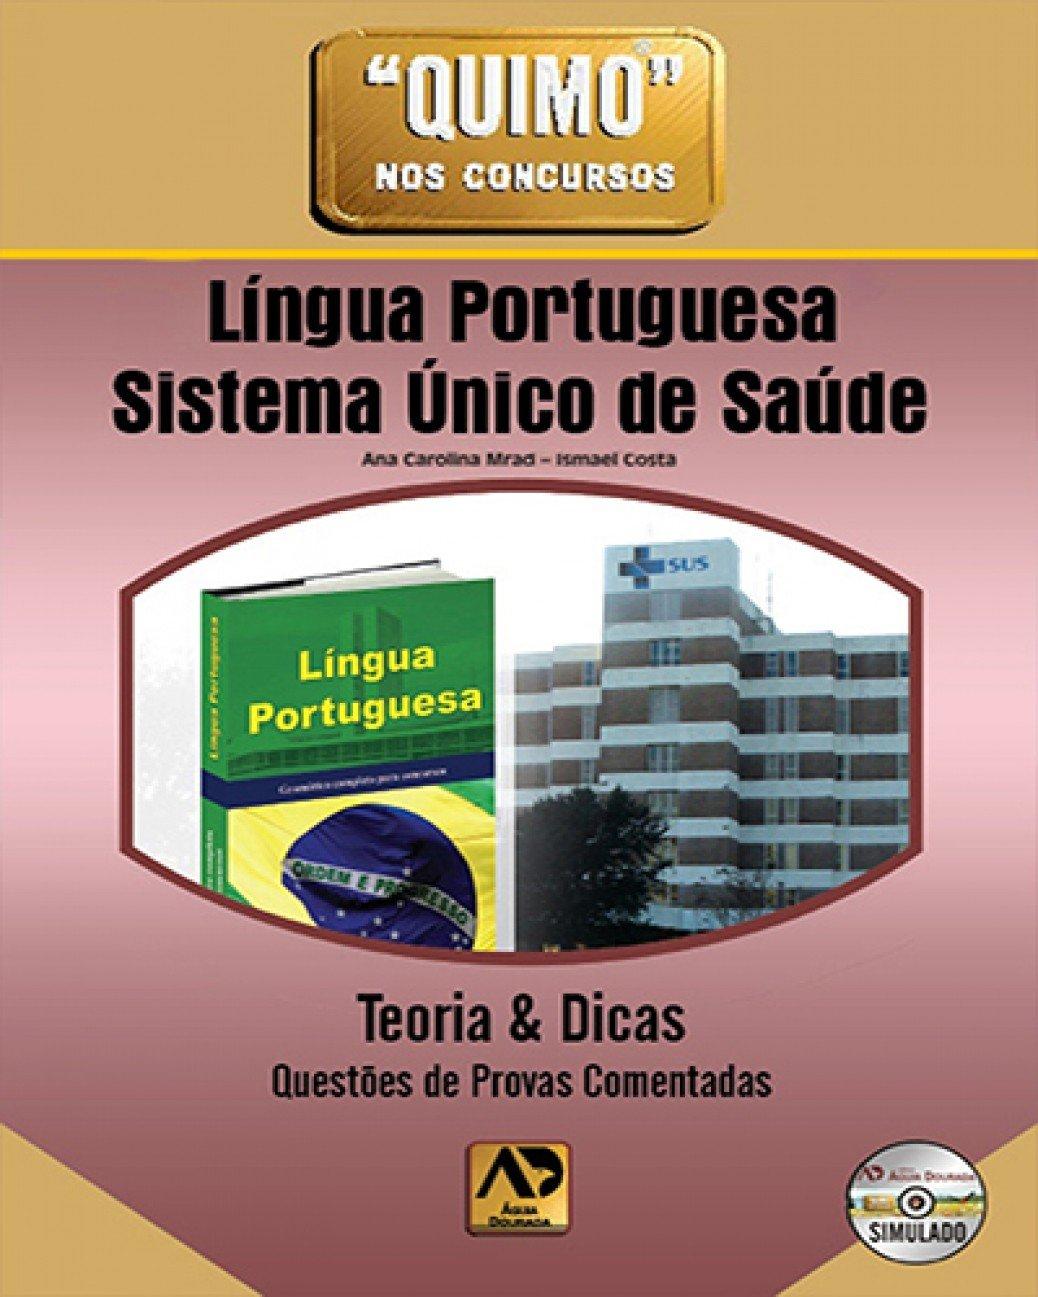 Quimo Nos Concursos - Lingua Portuguesa E Sistema Unico De Saude (Portuguese Brazilian) Paperback – 2012